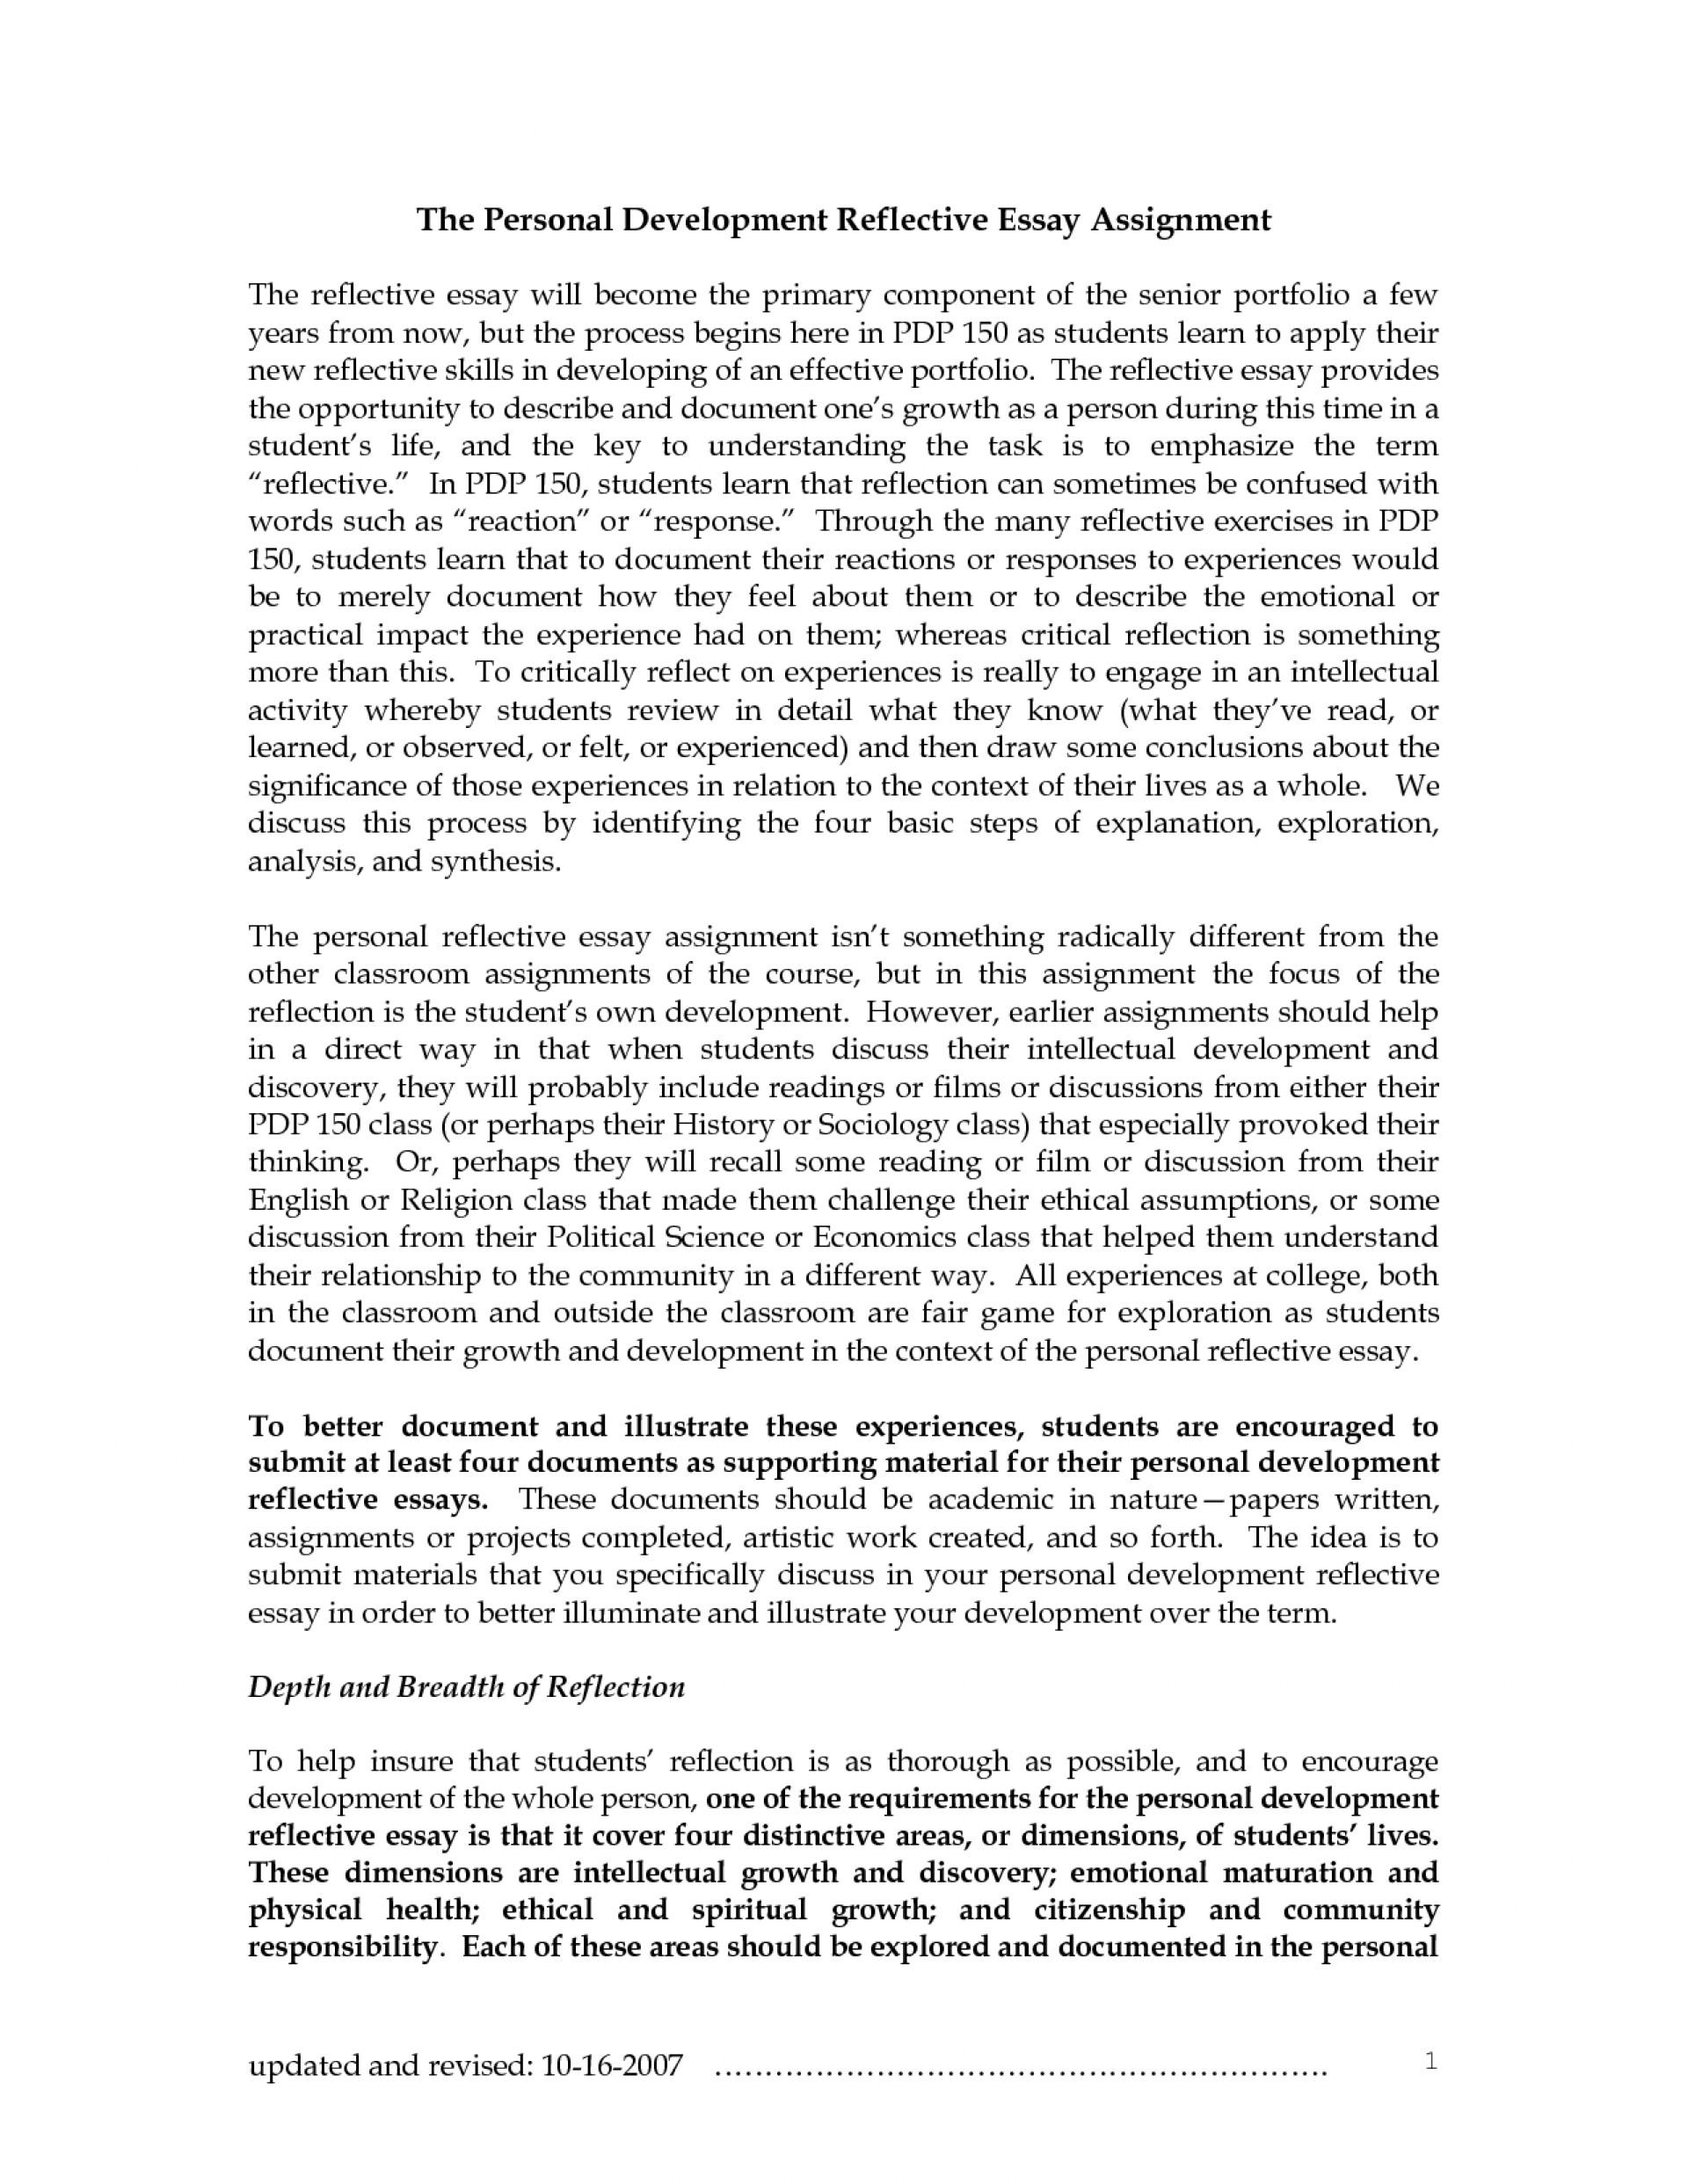 010 professional development essay example